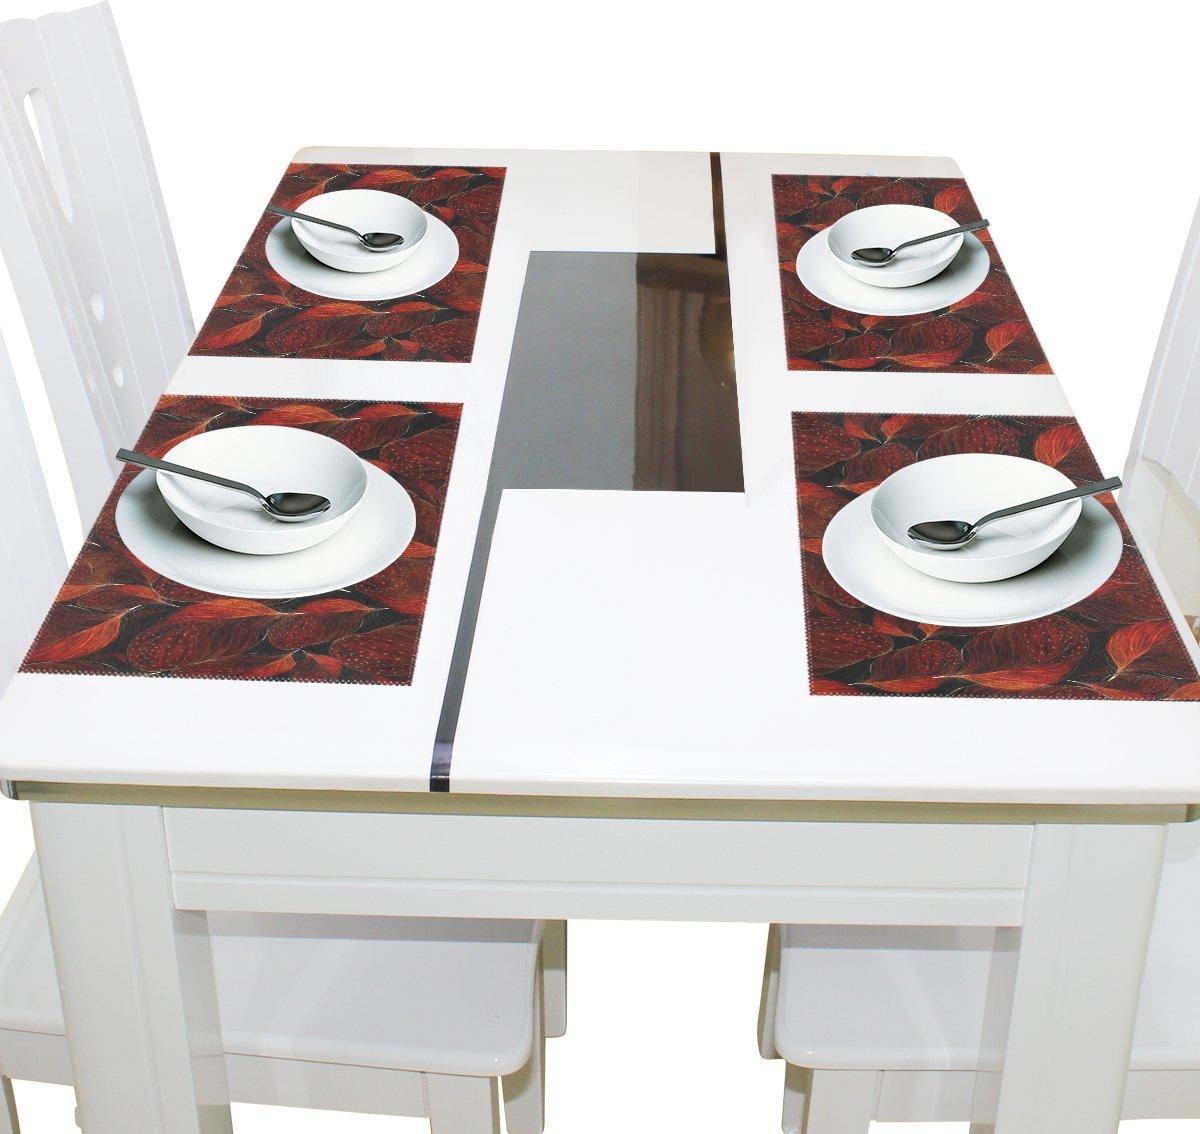 Carolines Treasures Newfoundland Welcome Kitchen or Bath Mat 24x36 24Hx36W Multicolor